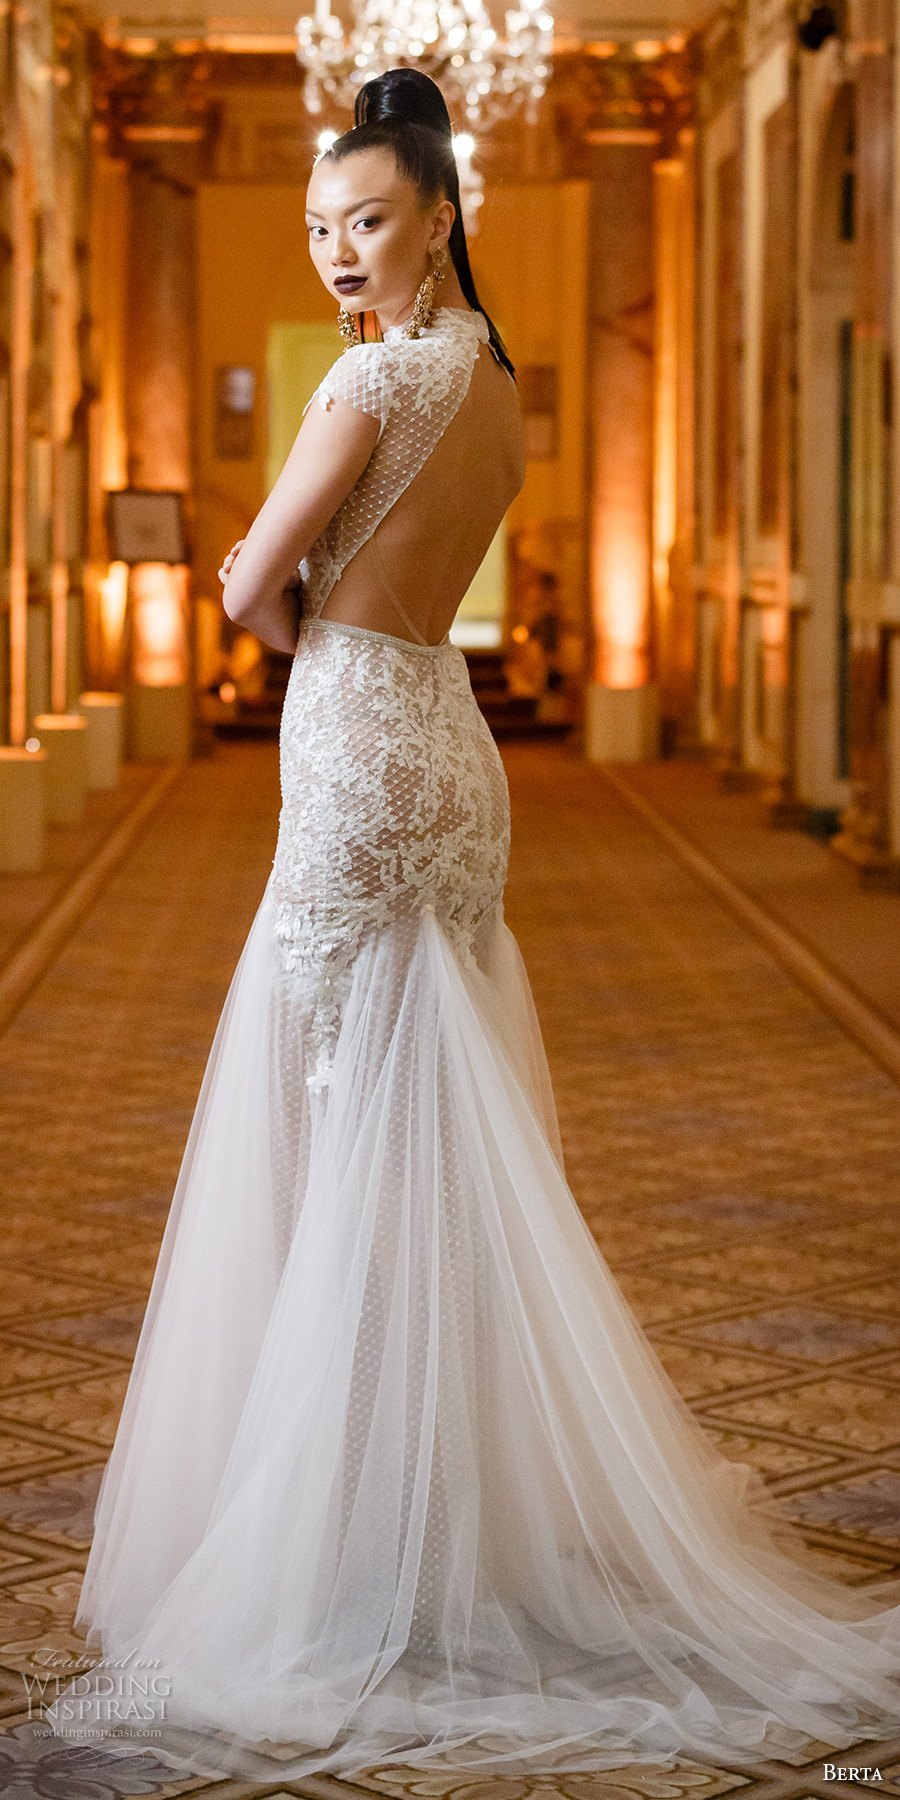 berta spring 2018 bridal cap sleeves high neck heavily embellished bodice tulle skirt flowy drop waist elegant a line wedding dress keyhole back sweep train (01) bv